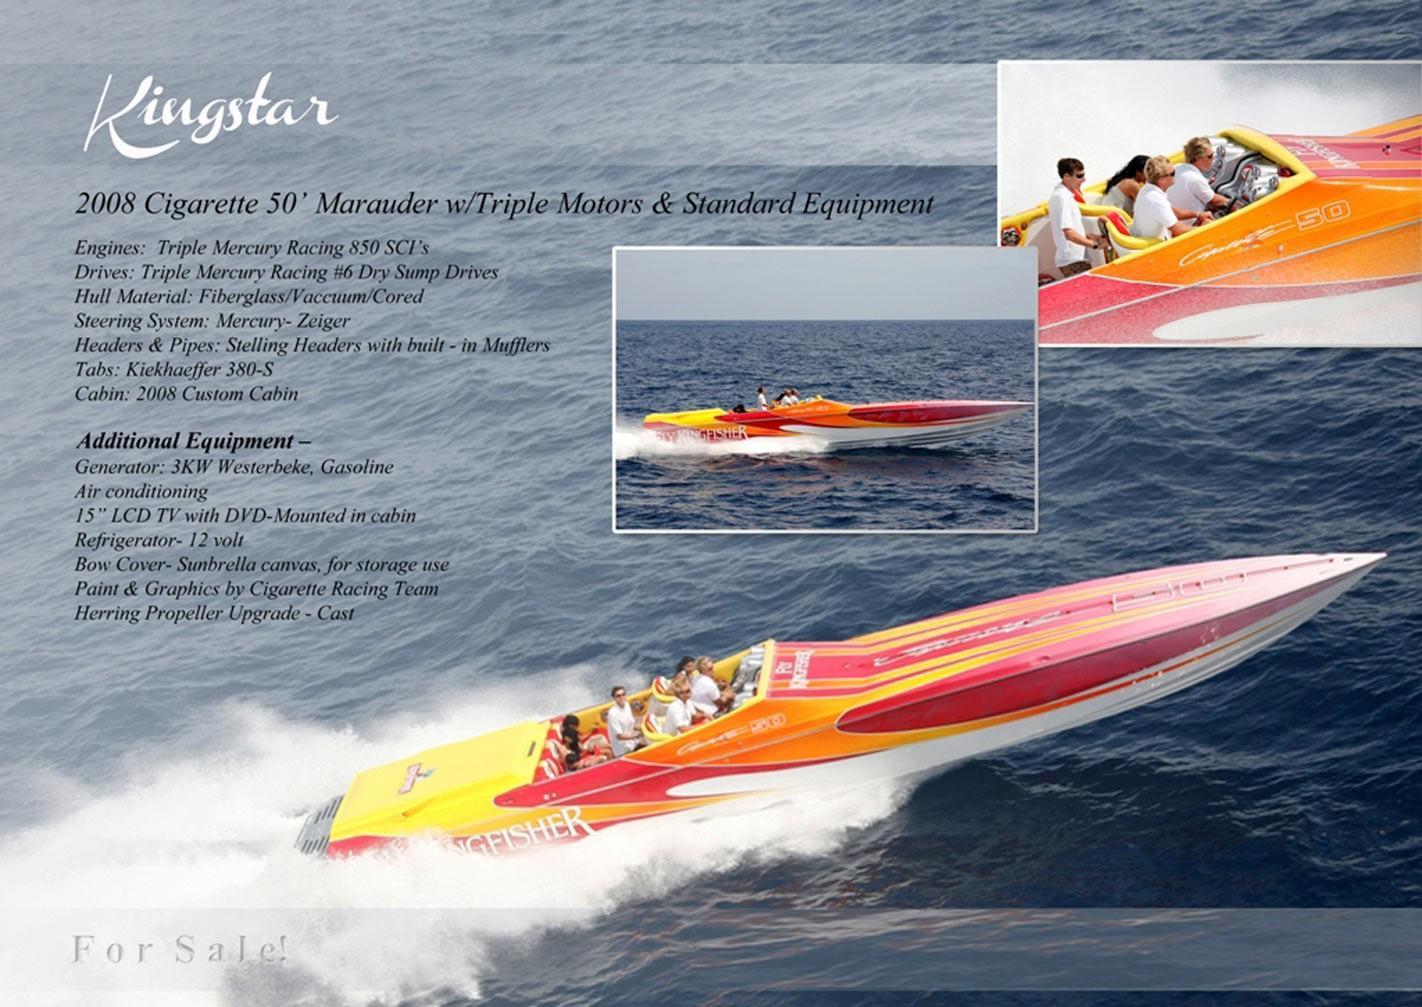 2008 Cigarette 50 Power Boat For Sale - www yachtworld com